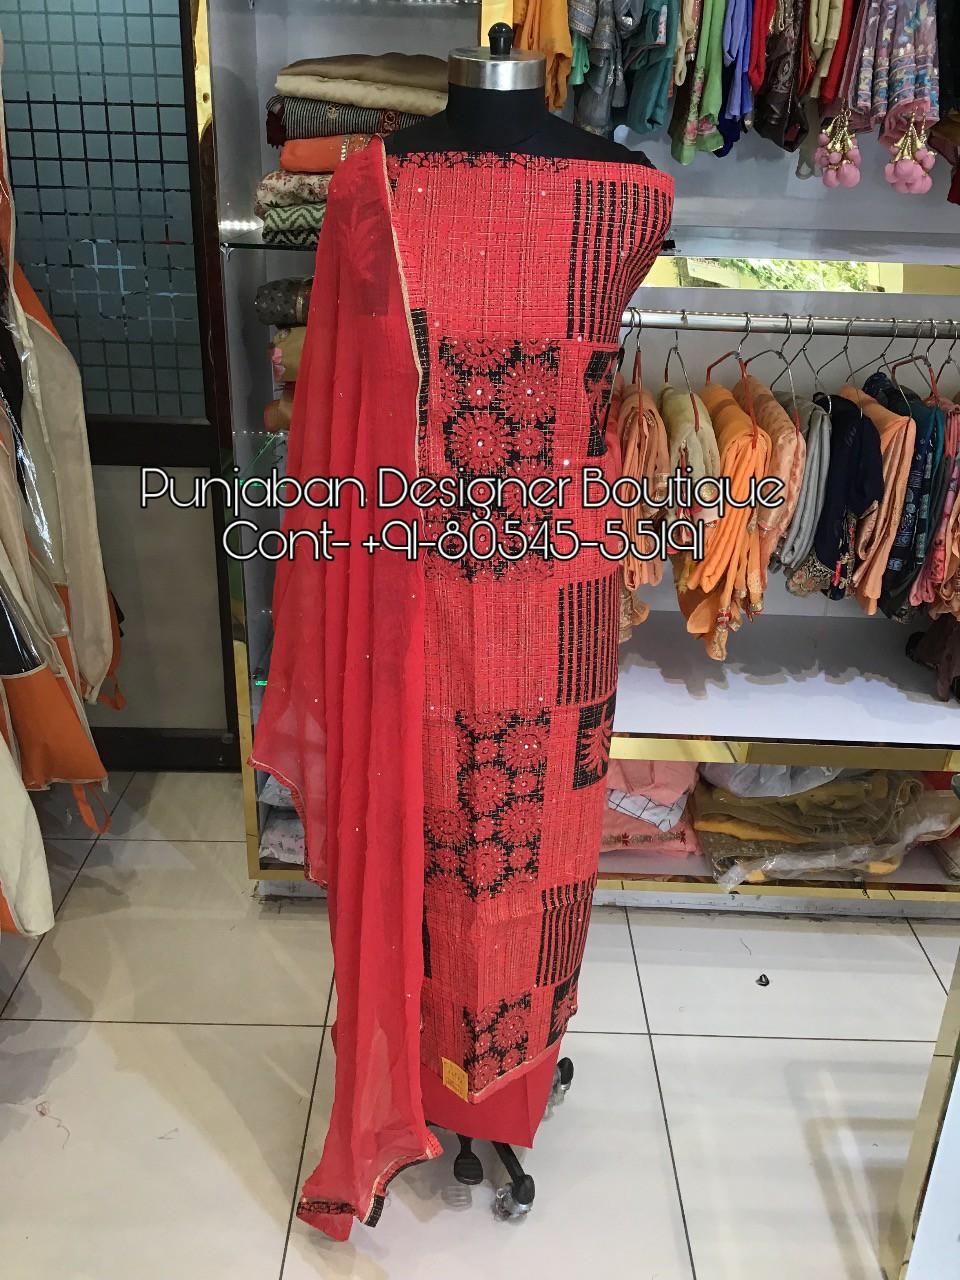 New Designer Punjabi Suits With Price Punjaban Designer Boutique